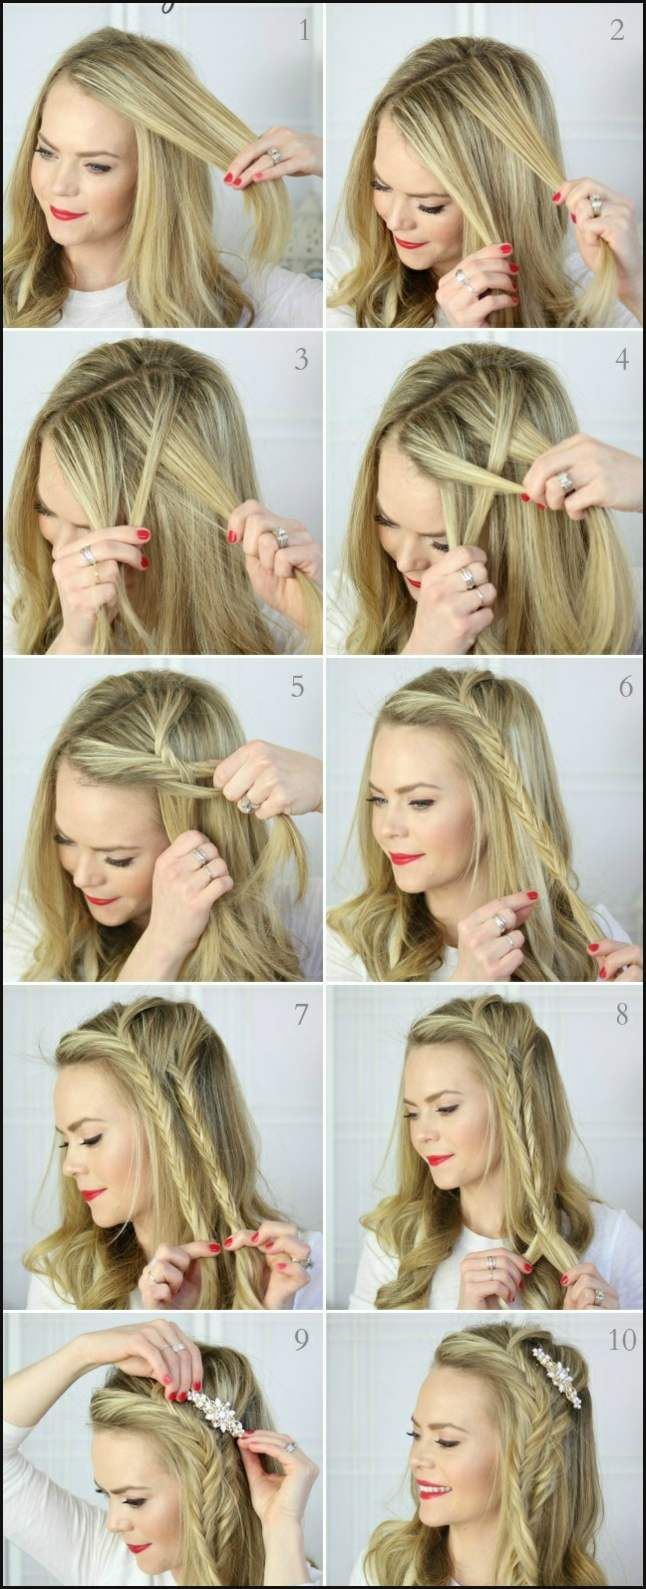 Oktoberfest Frisuren Zum Dirndl 27 Anleitungen Einfache Frisuren Hair Styles Long Hair Styles Fish Tail Braid